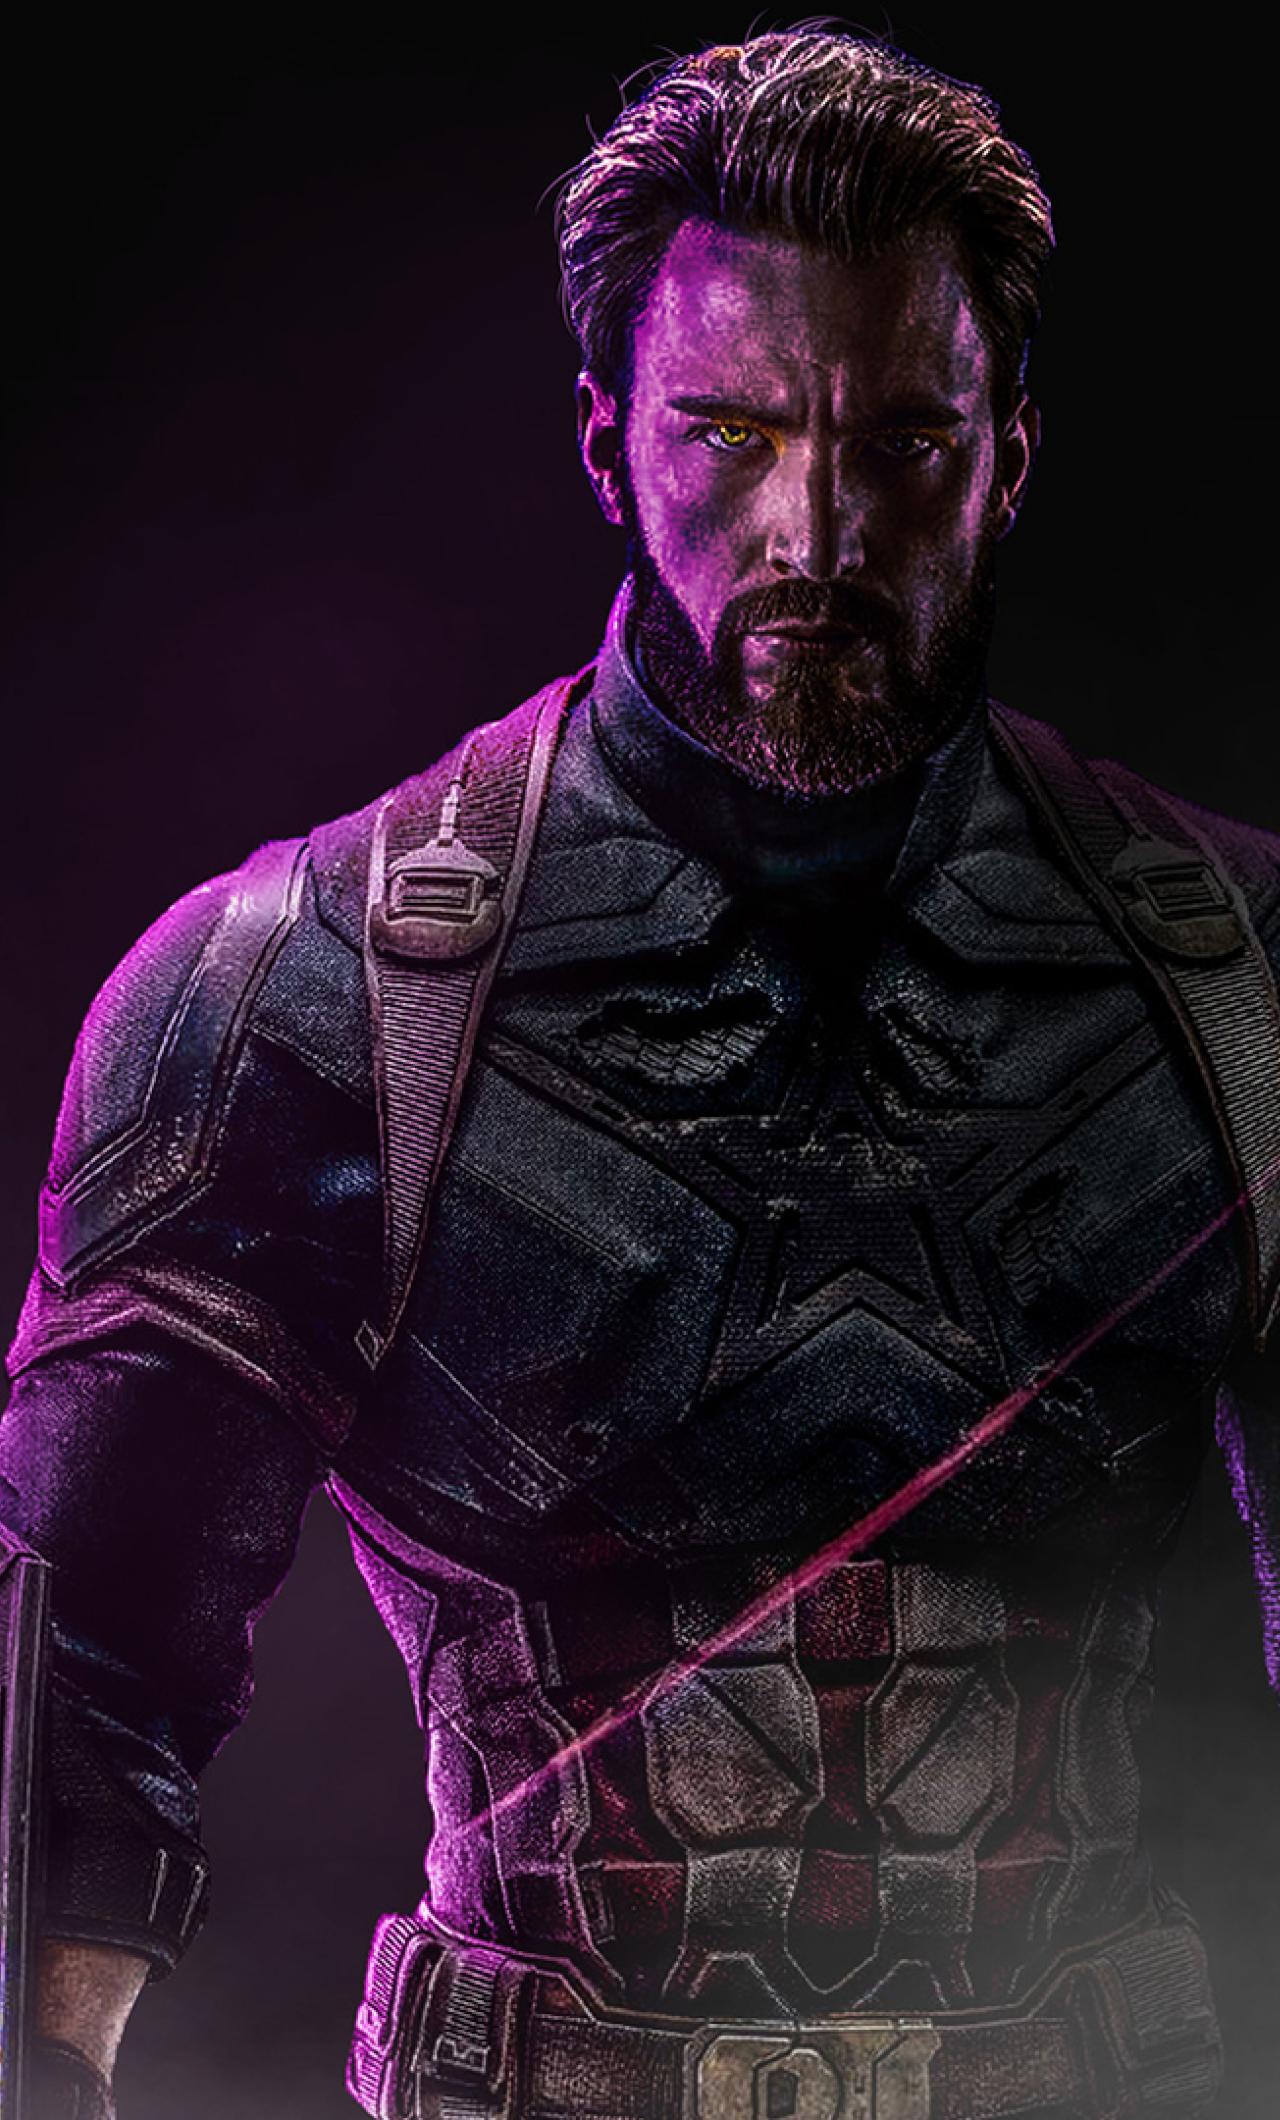 Hd Wallpaper - Captain America Wallpaper 4k (#551607) - HD ...